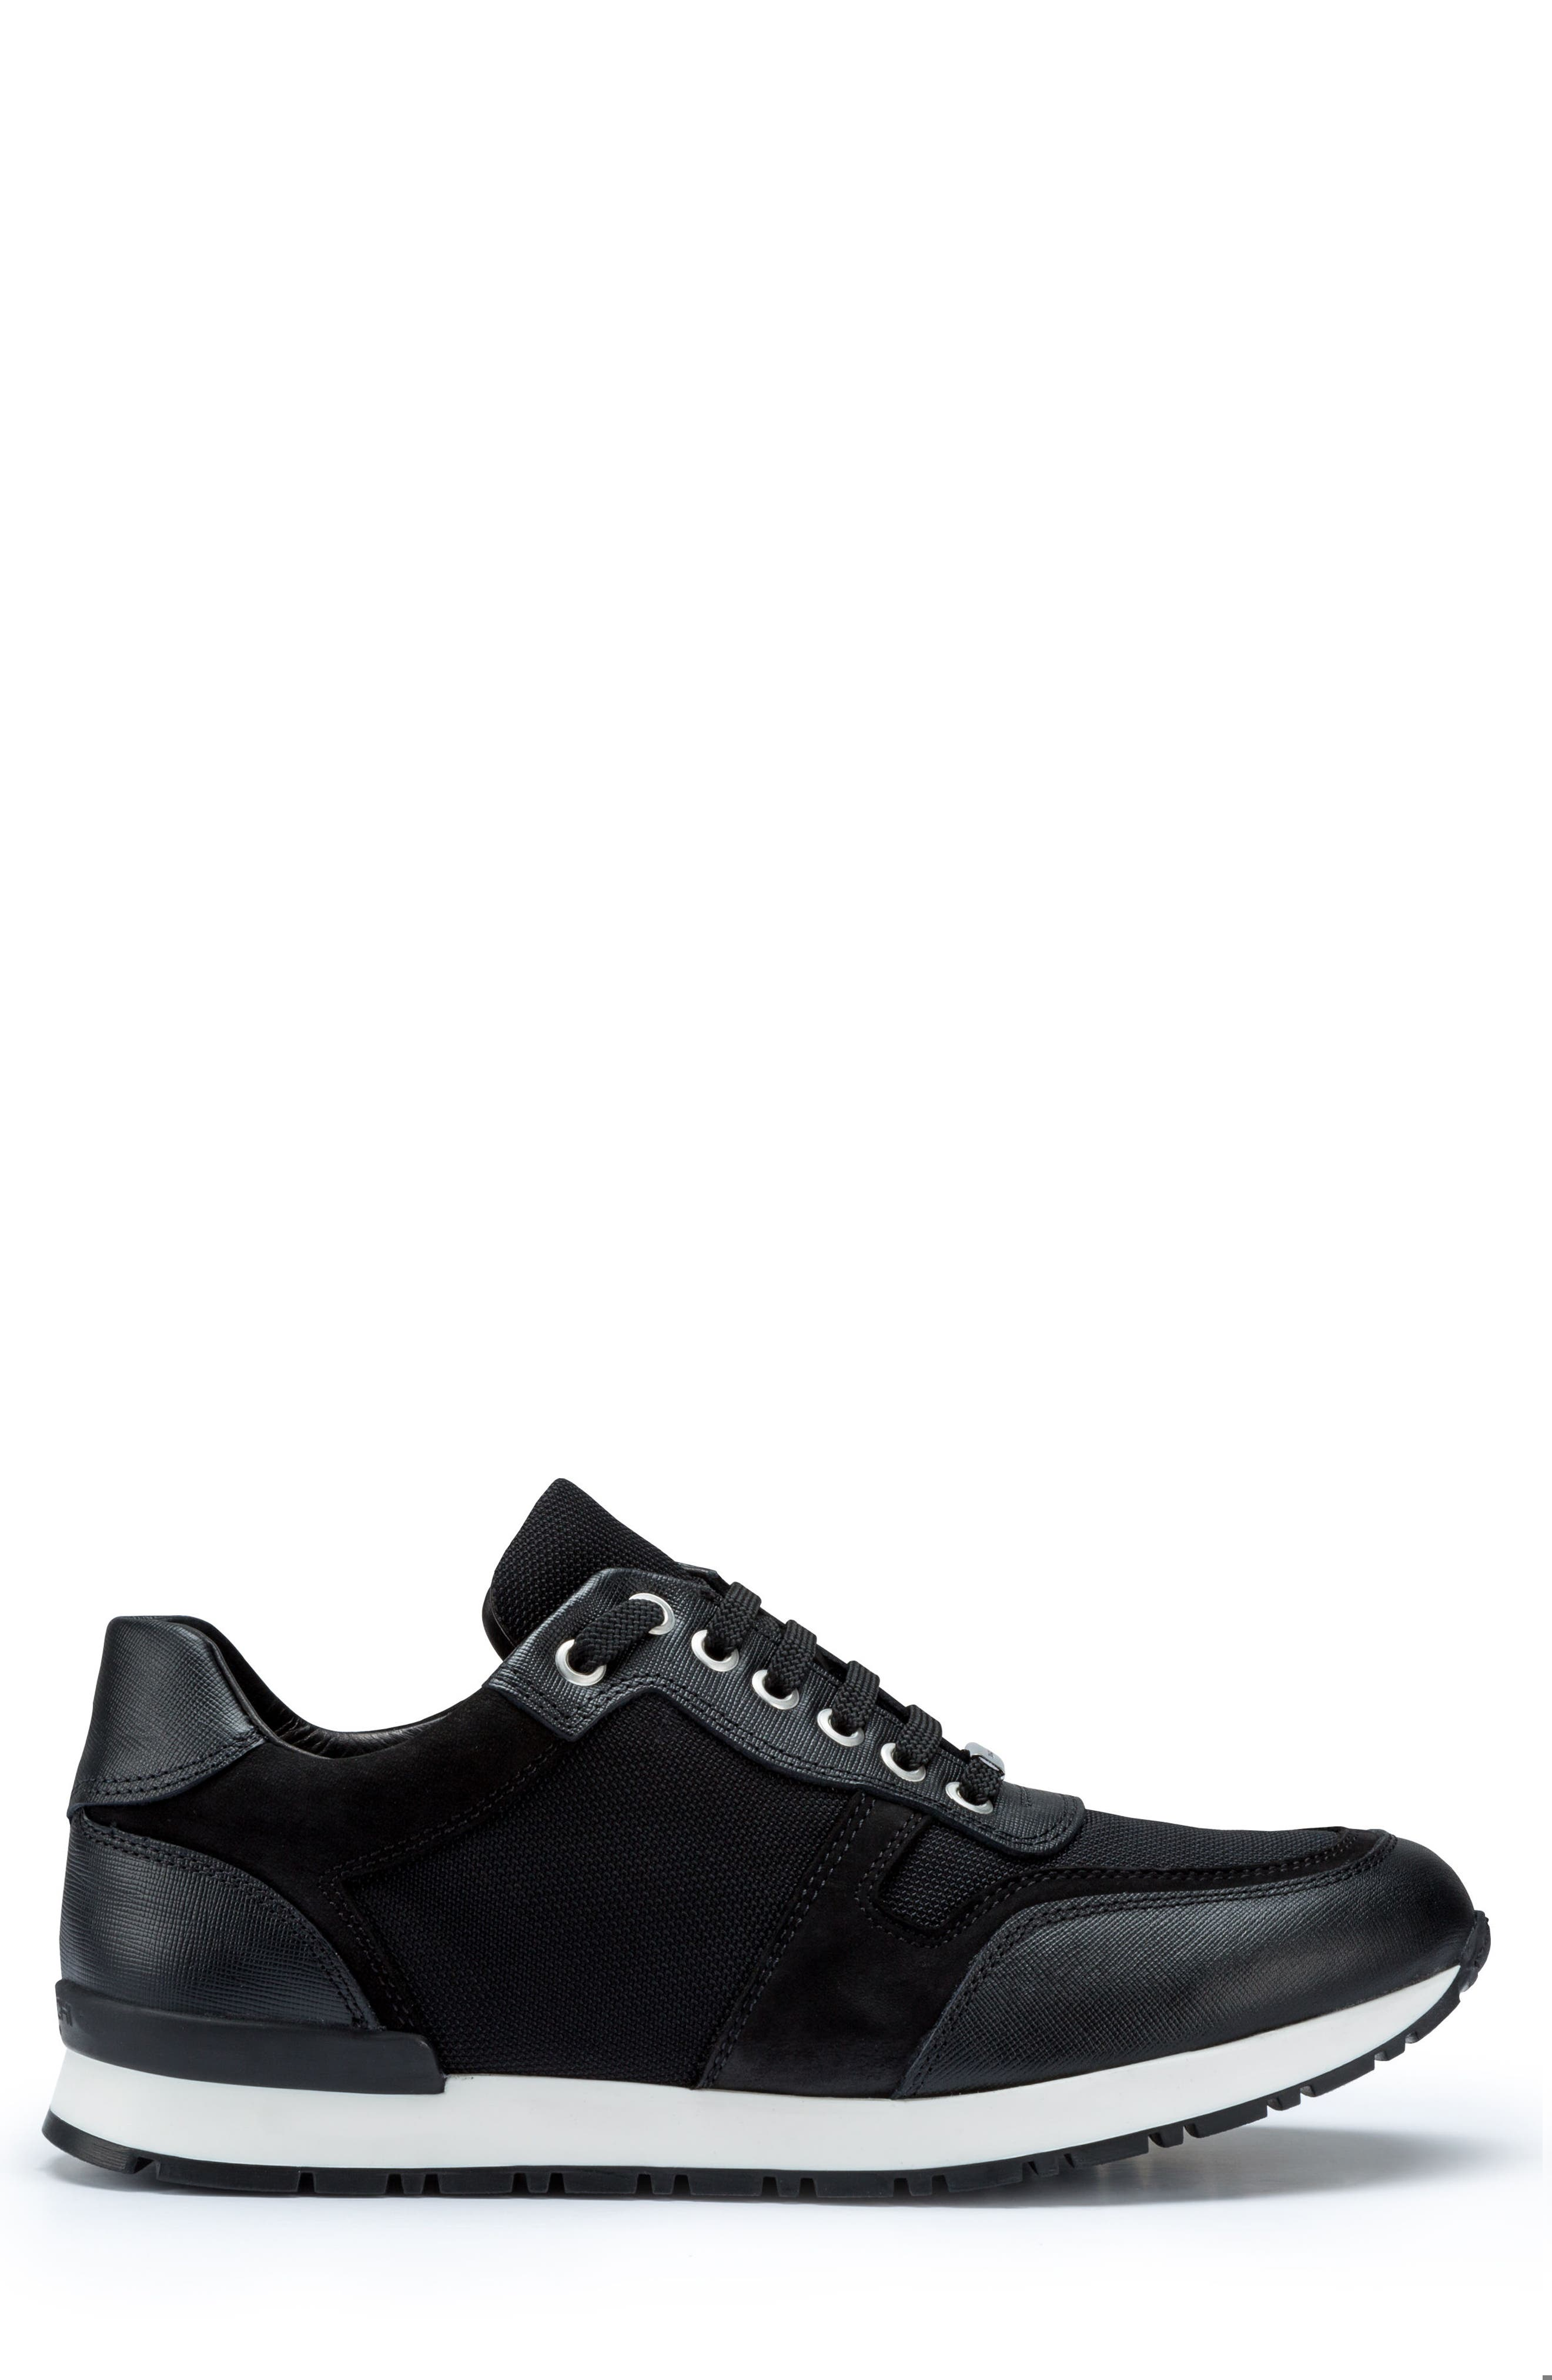 Modena Sneaker,                             Alternate thumbnail 3, color,                             Nero